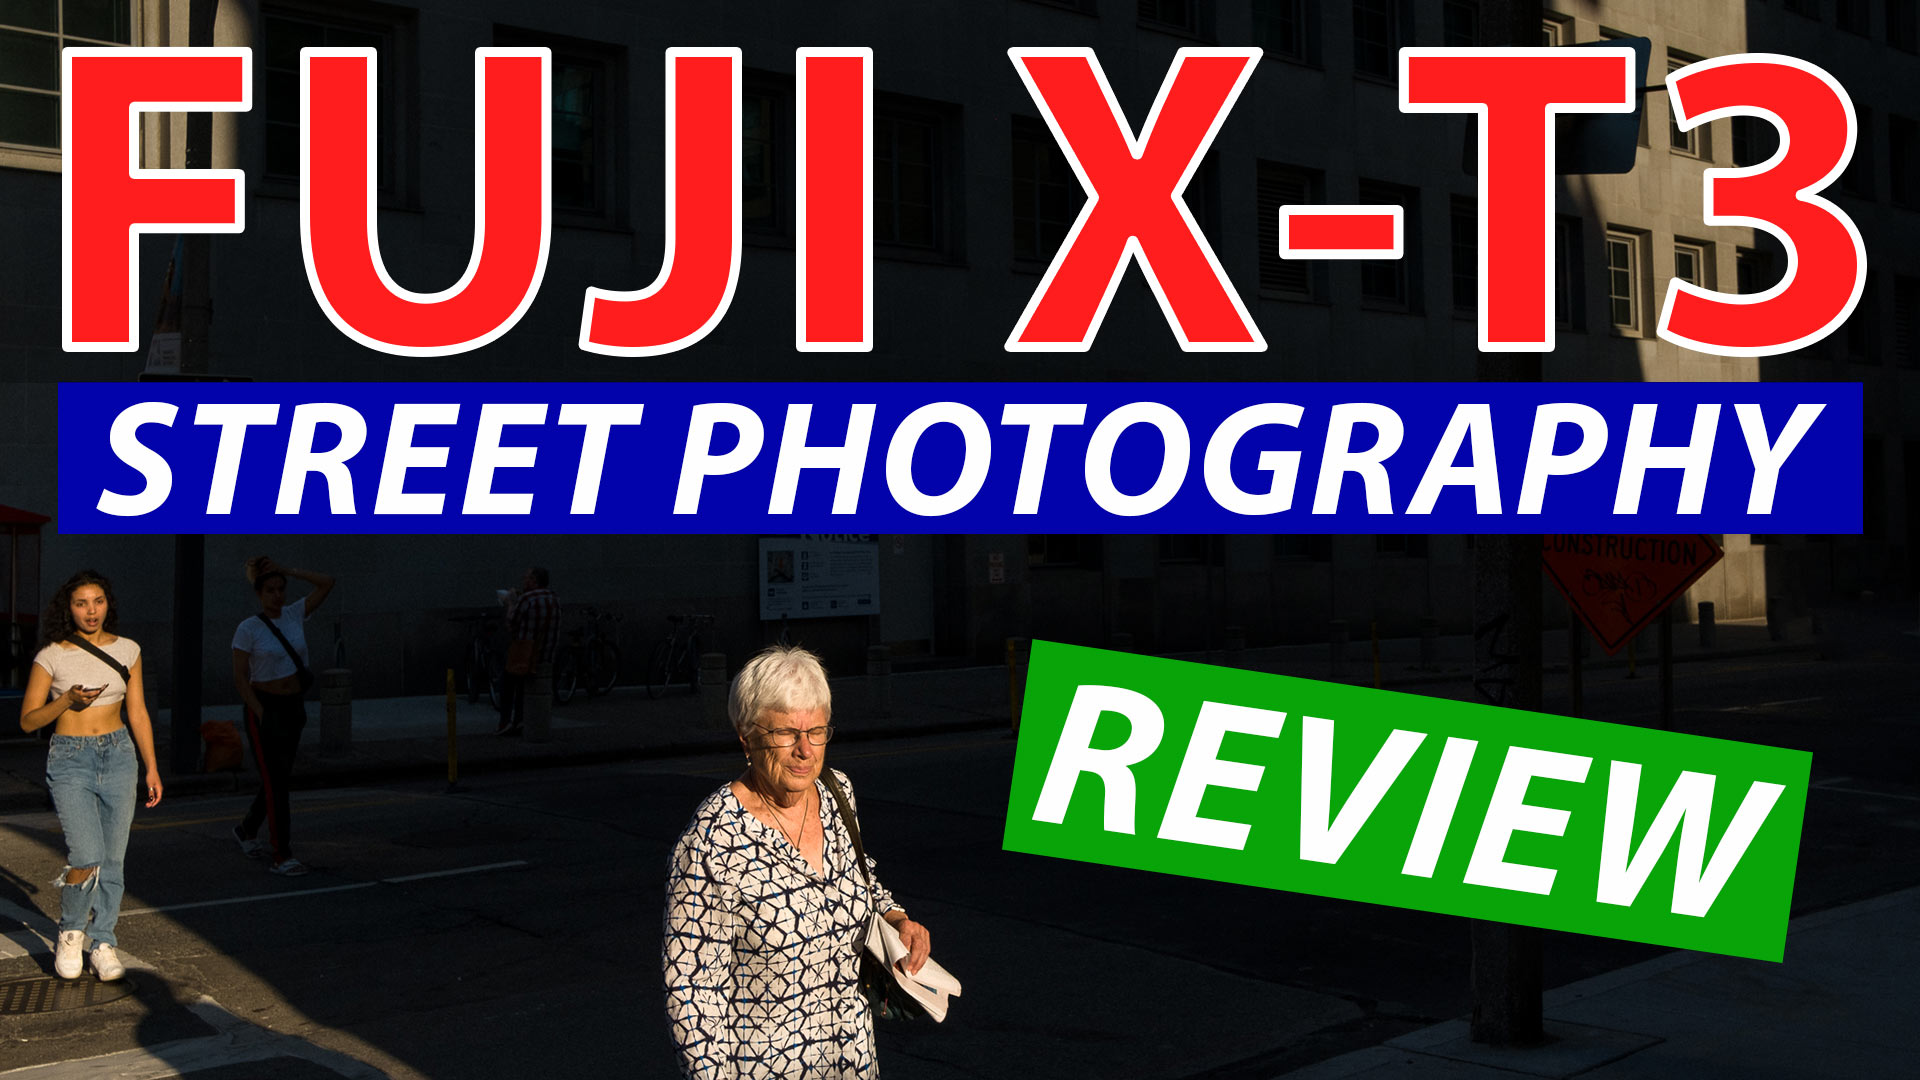 Fuji XT3 Street Photography Review - It's Fantastic